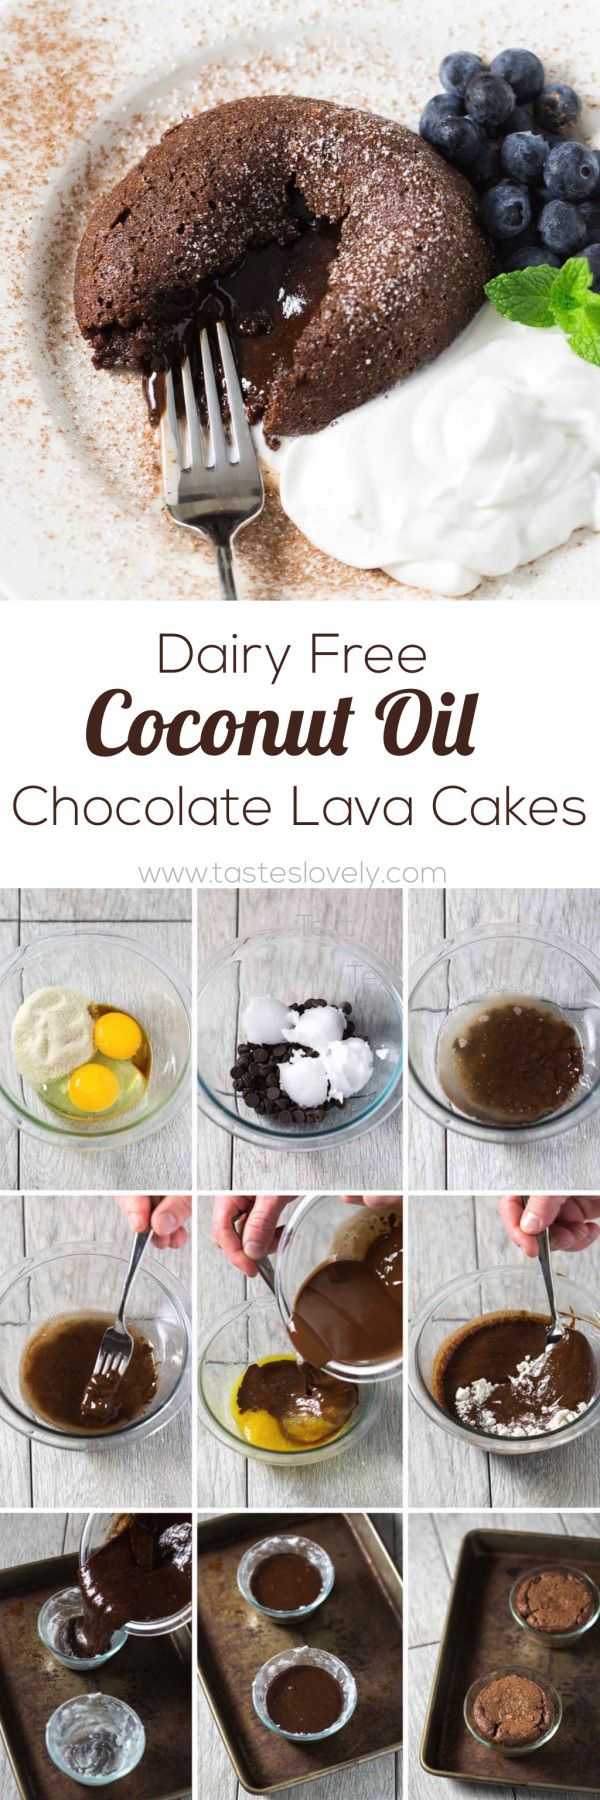 Dairy Free Coconut Oil Chocolate Molten Lava Cakes